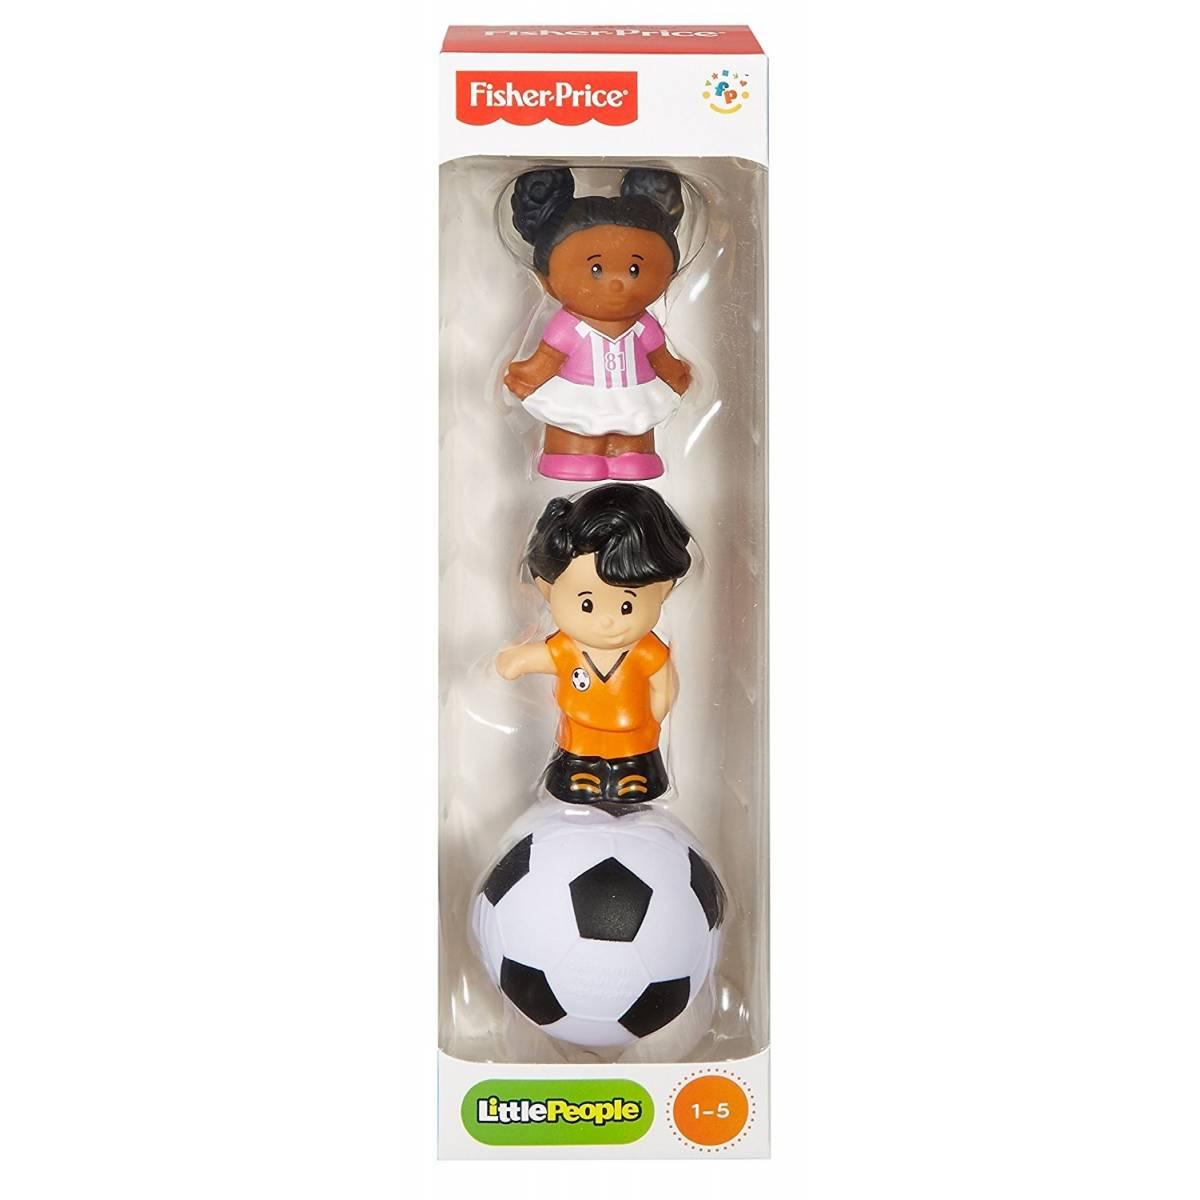 Fisher Price - Tube Figurine Little People - Football